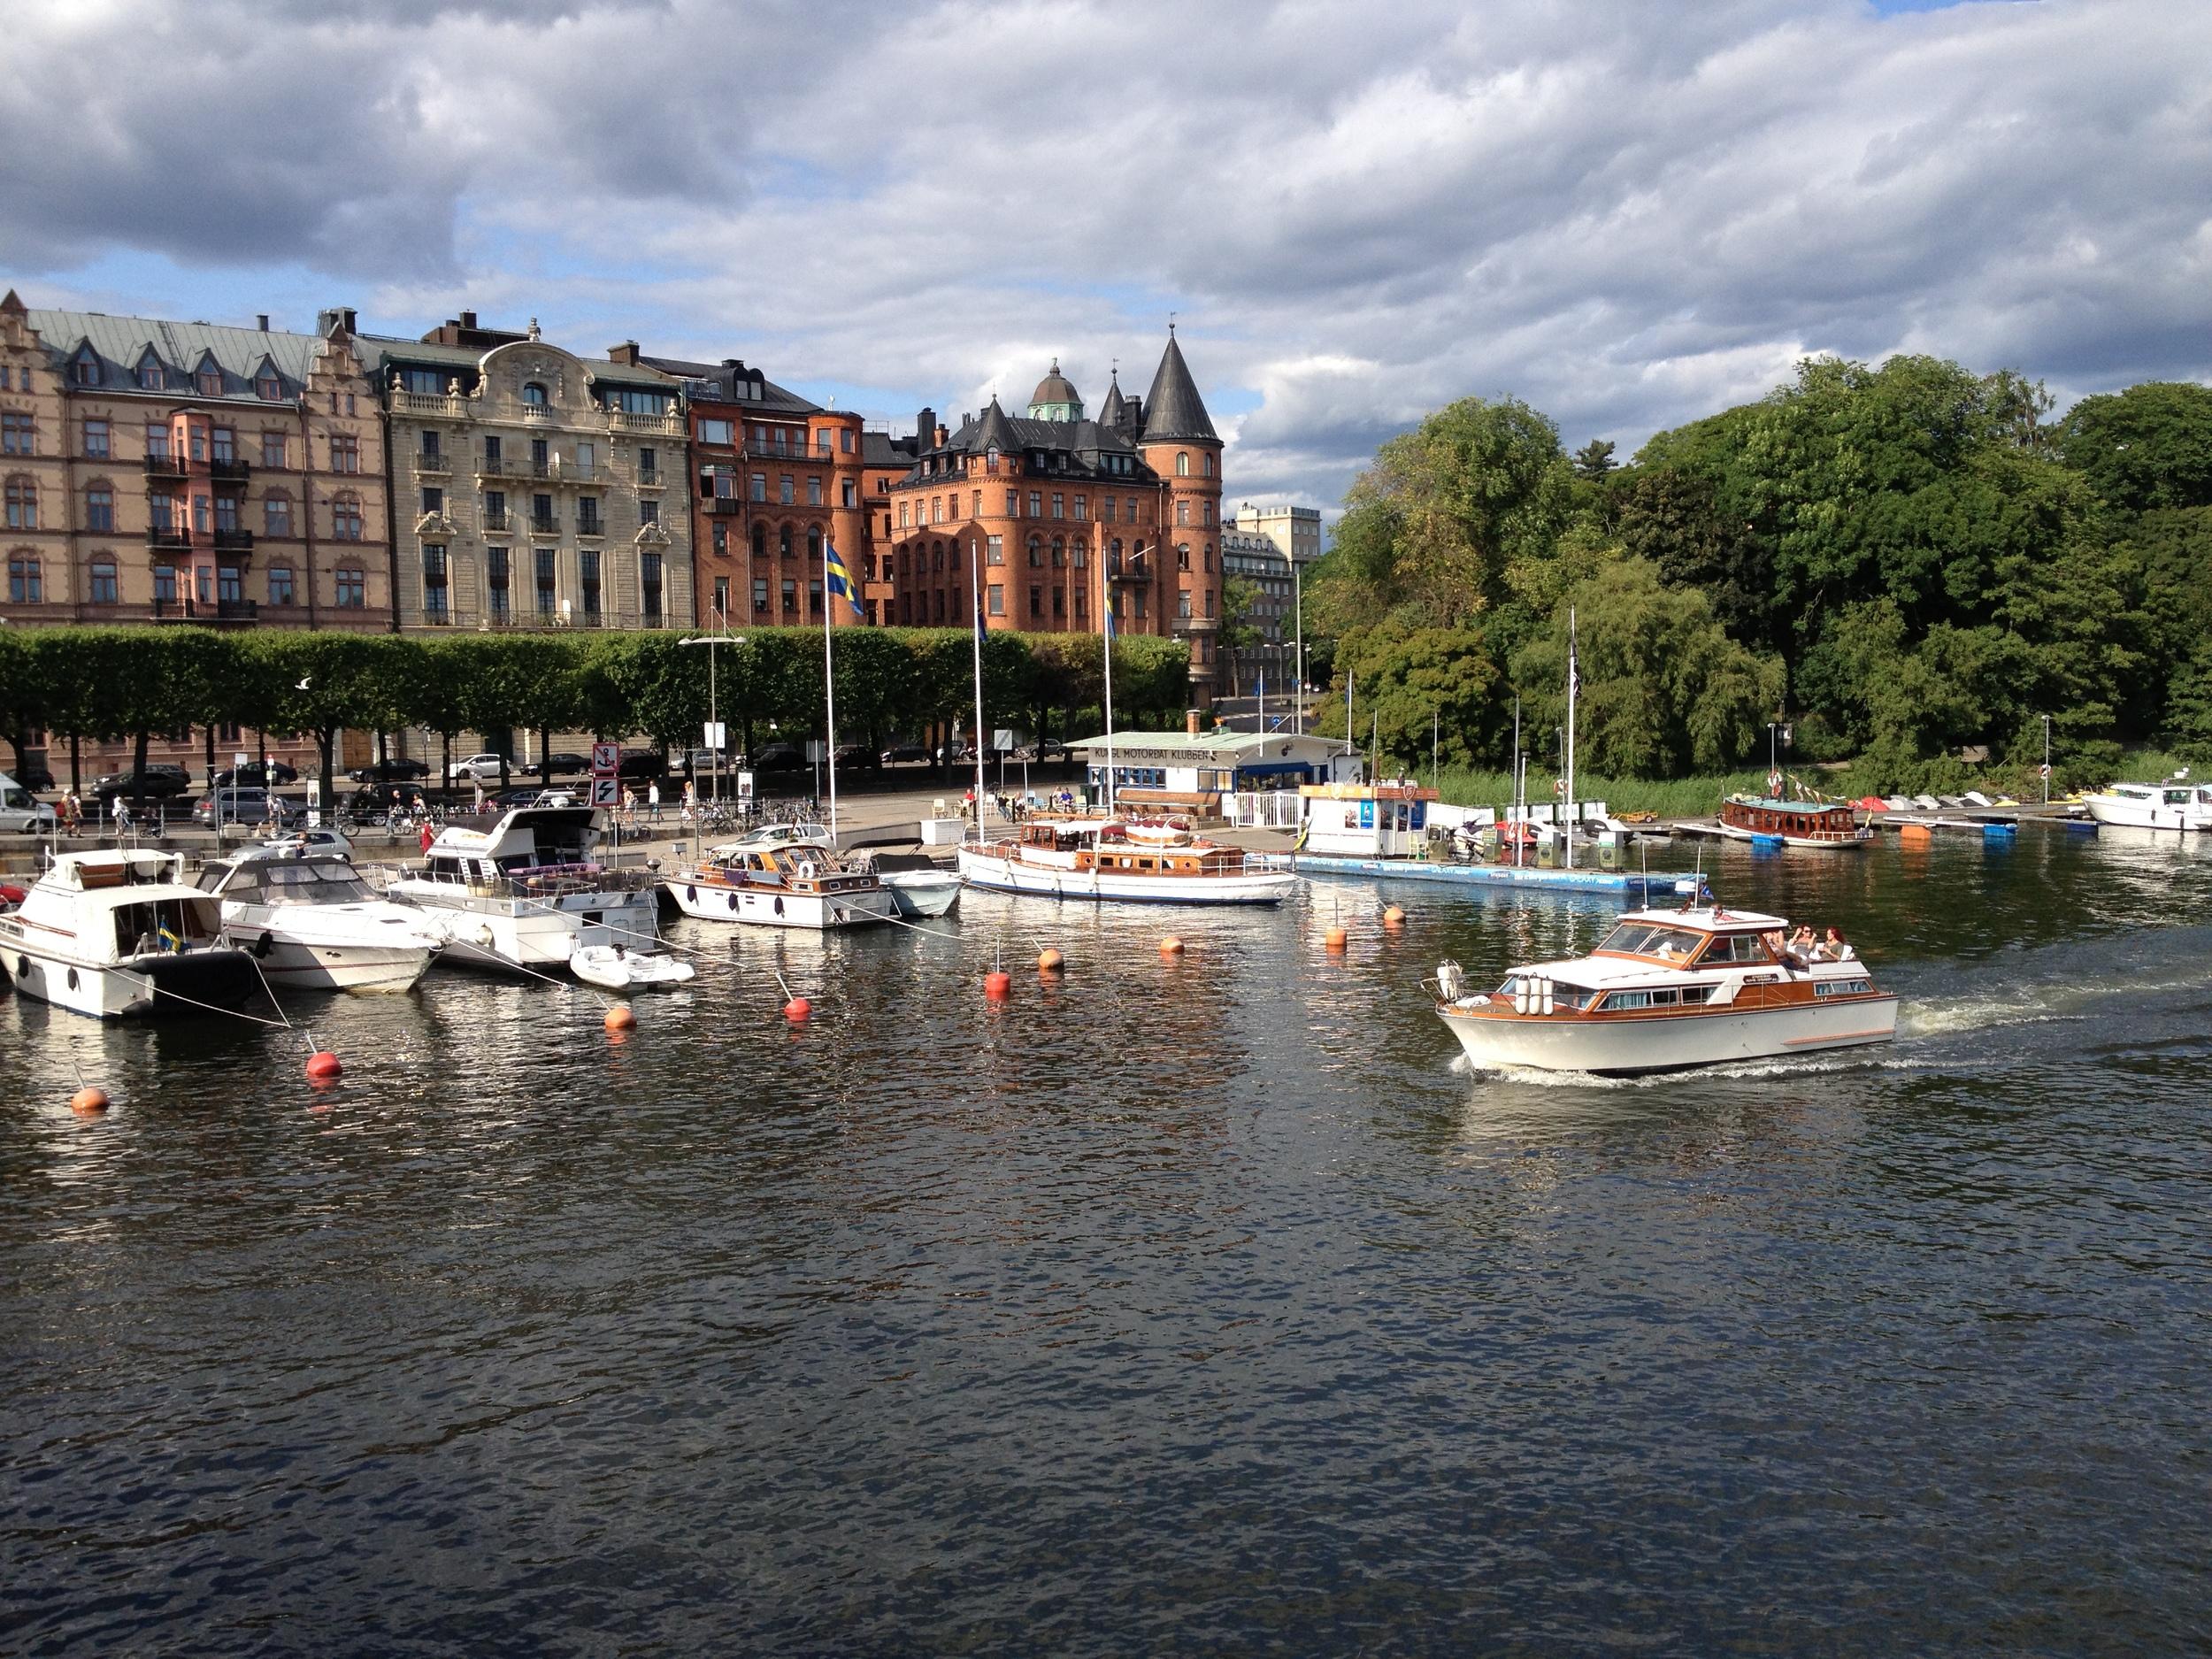 2013-07-06 17.14.52 STOCKHOLM.jpg